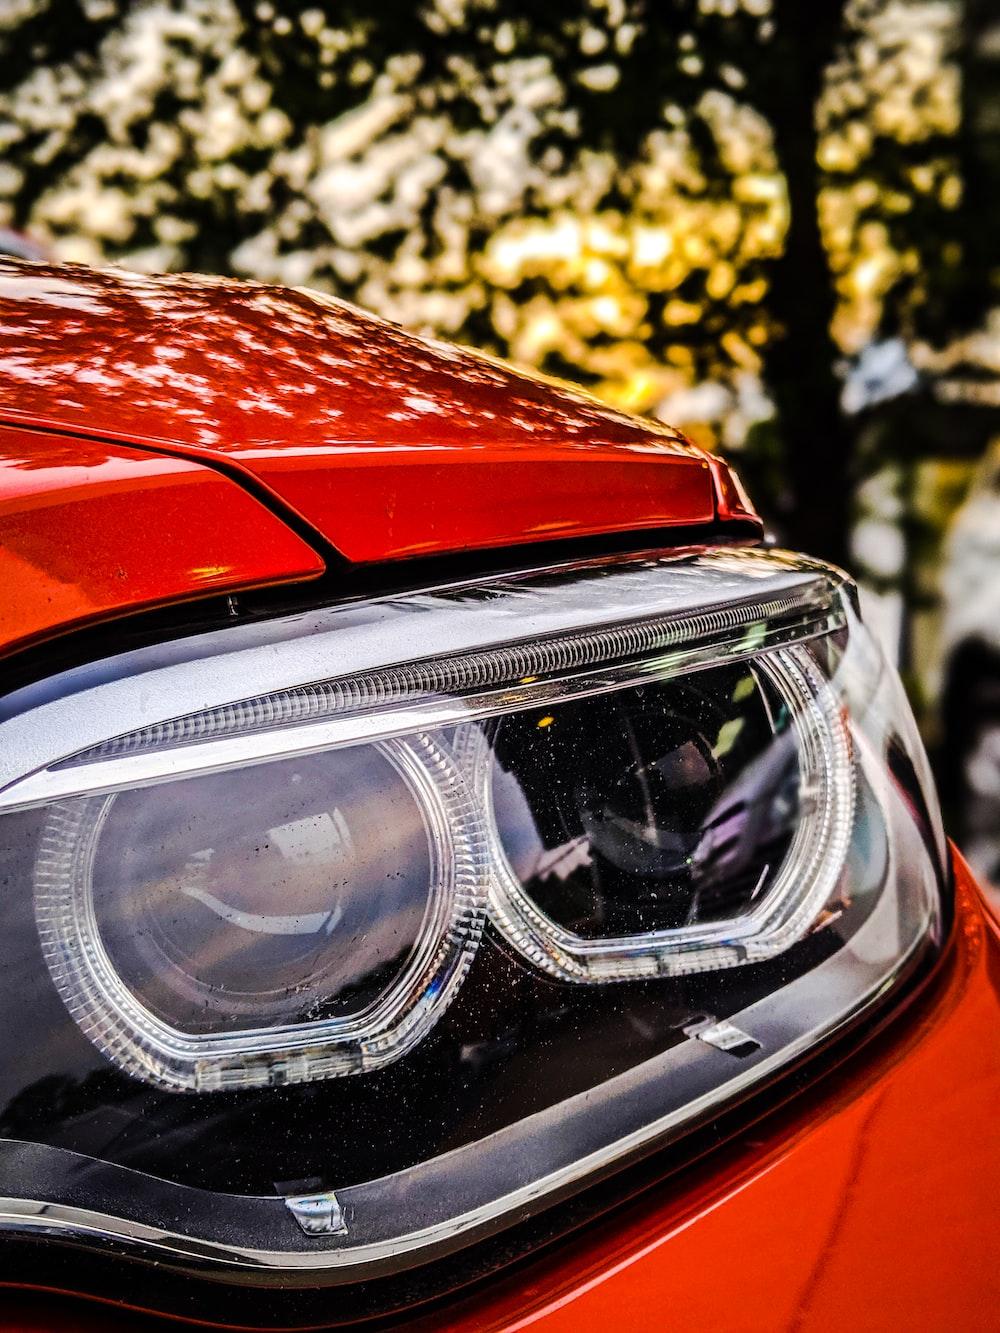 vehicle headlight in close up photo